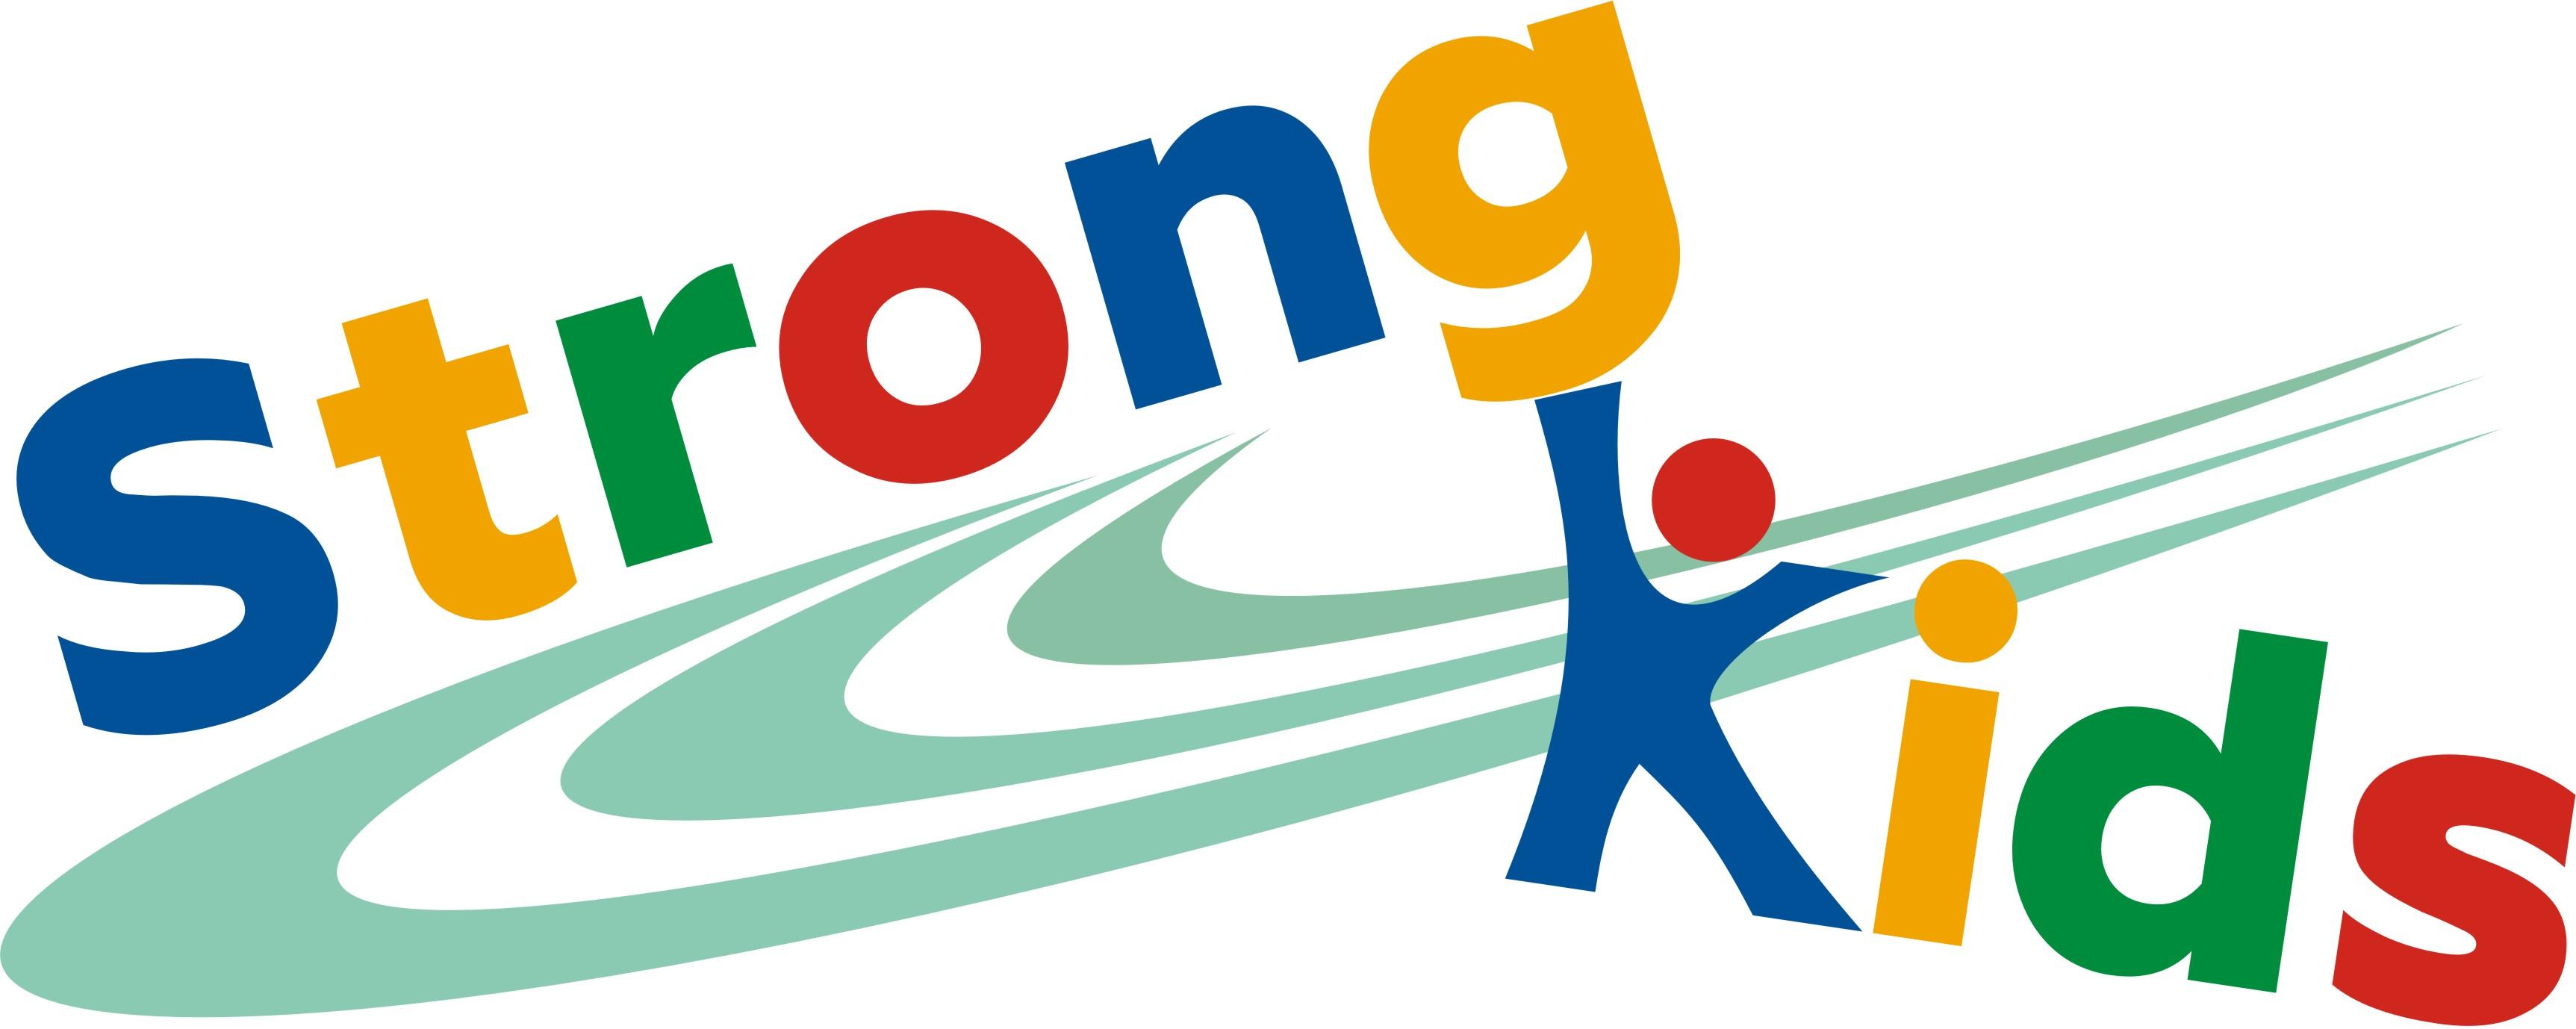 Логотип для Детского Интернет Магазина StrongKids фото f_9705c88f09b0389c.jpg